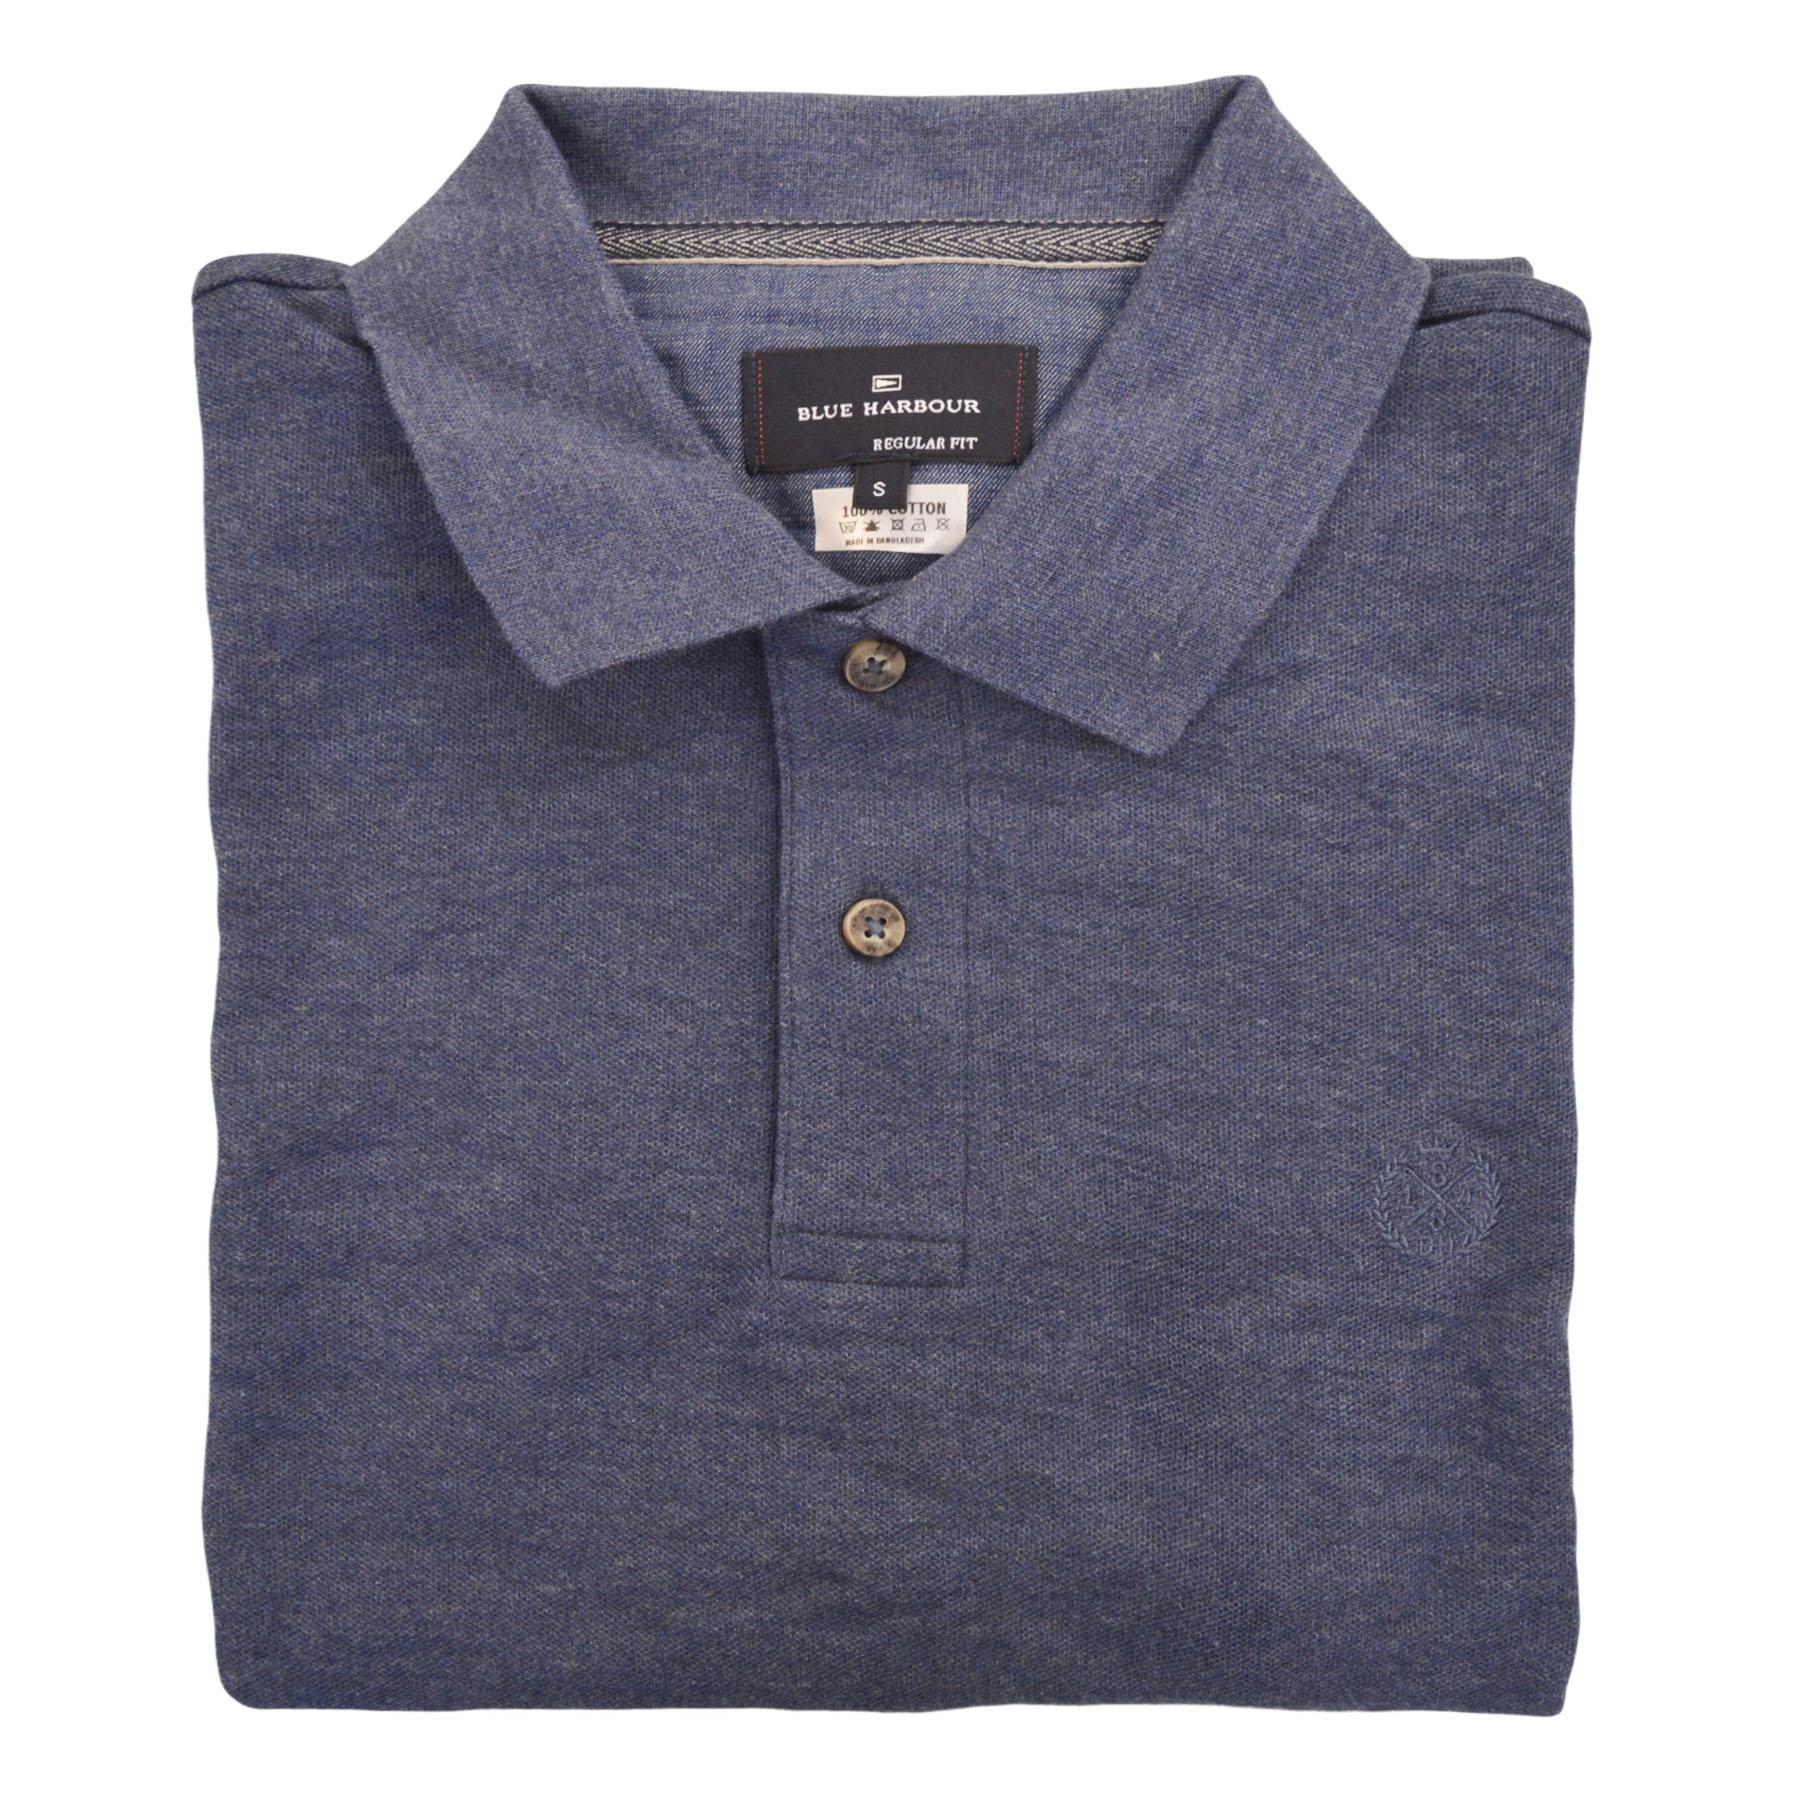 M-amp-S-BLUE-HARBOUR-Camisa-Polo-Para-Hombre-a-Rayas-Contraste-Cuello-Logotipo-Bordado miniatura 9